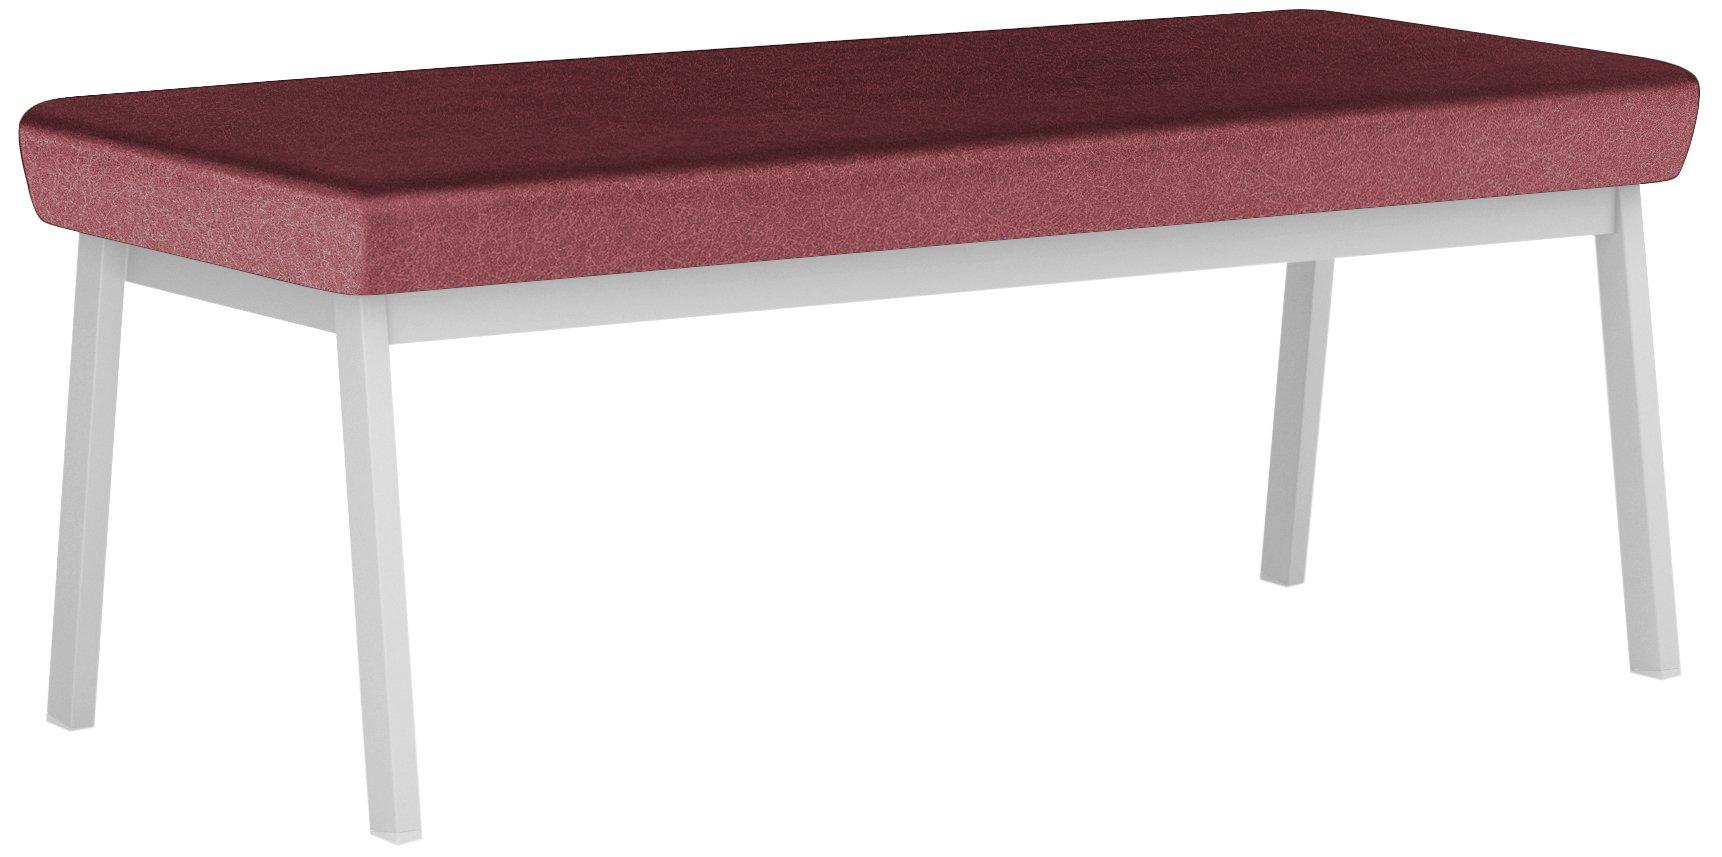 Newport Healthcare Vinyl 2-Seat Bench, Renaissance Wineberry, Silver